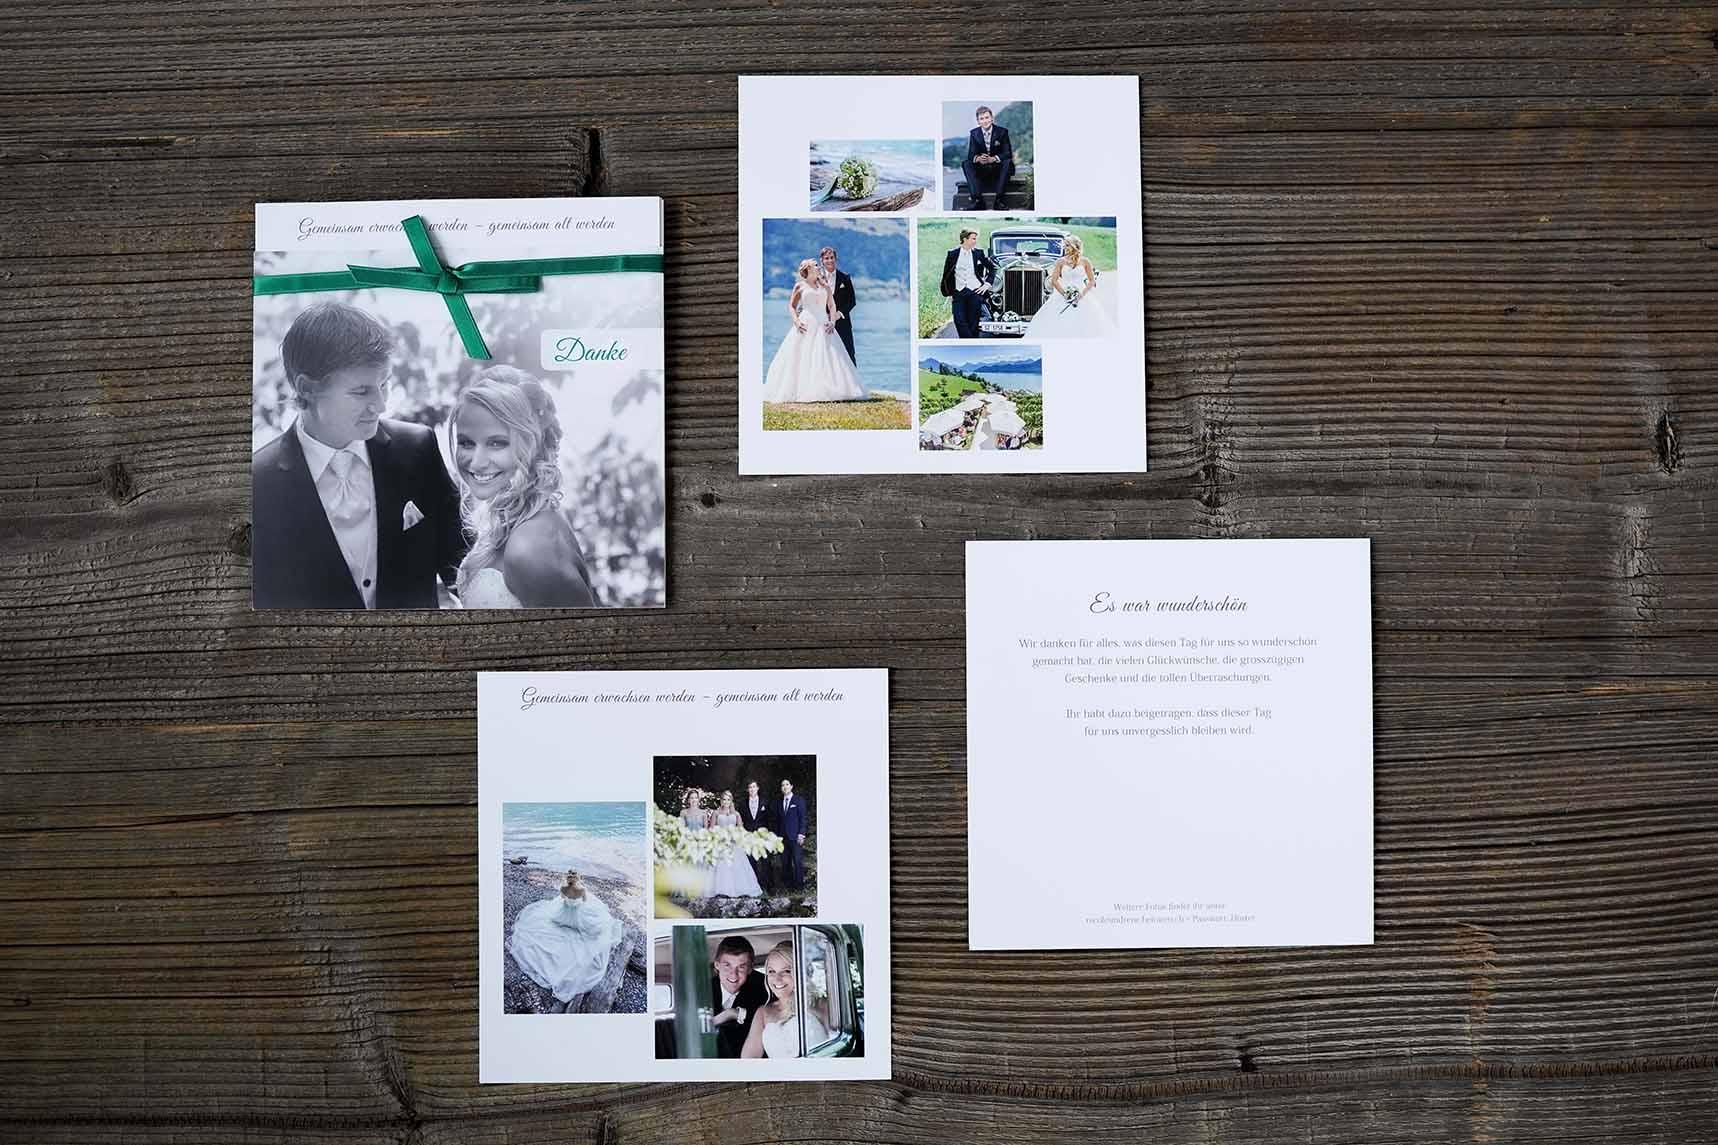 Hochzeitsdankeskarte René & Nicole